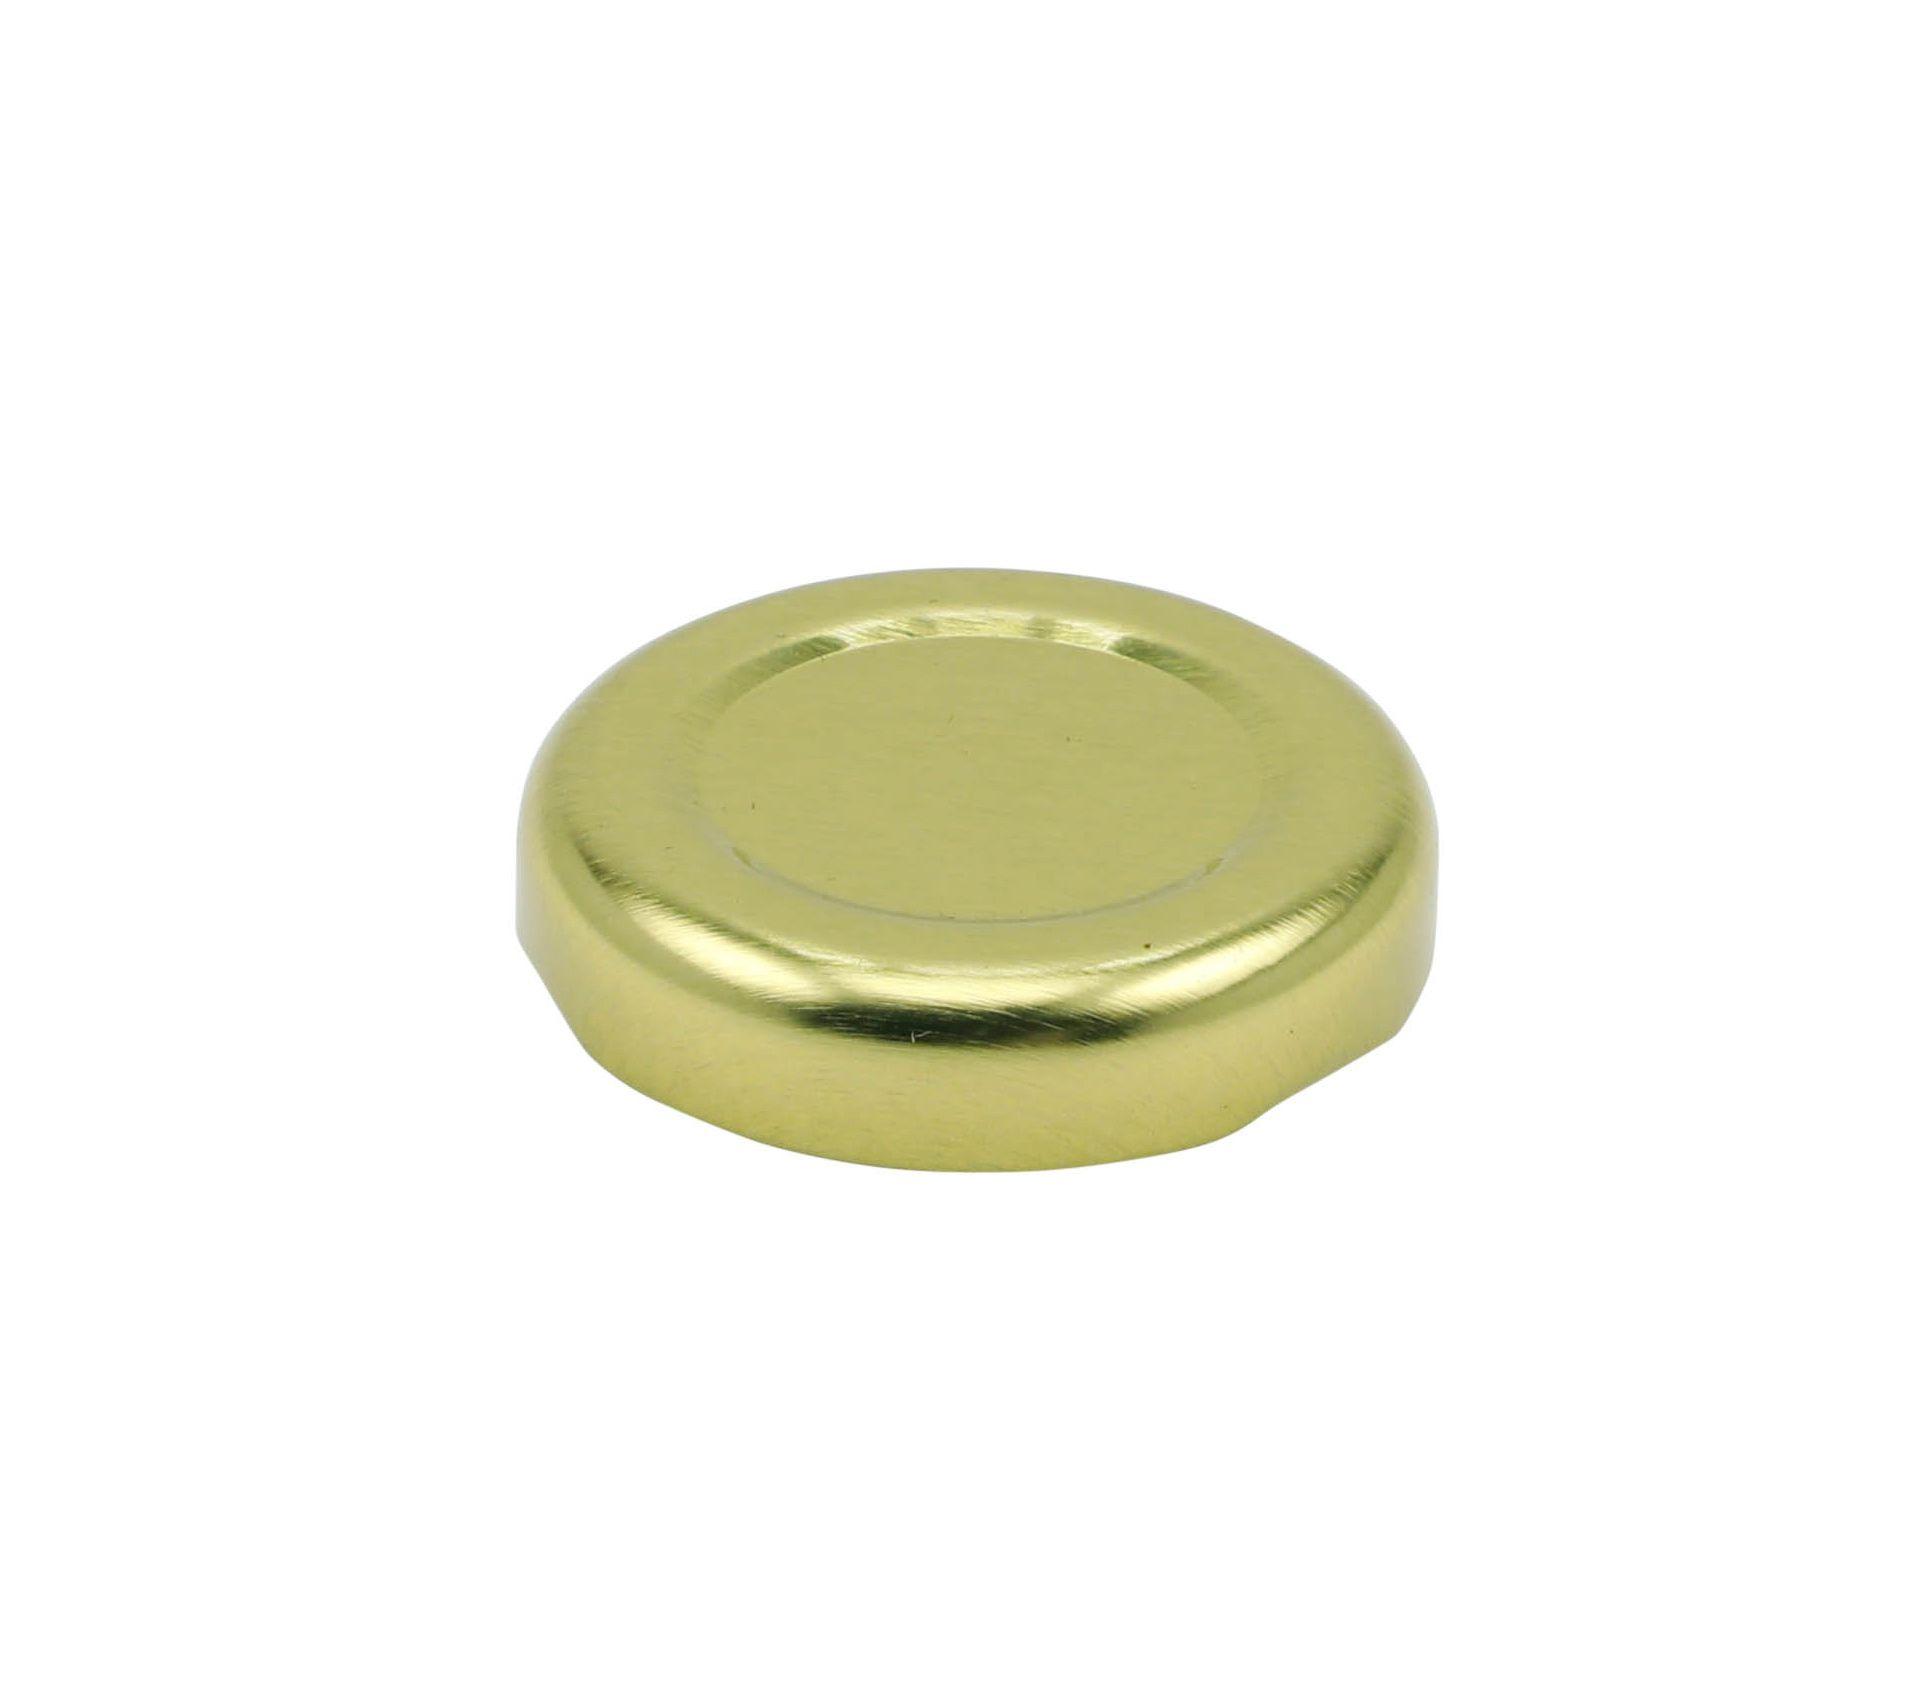 Potes Mini Sextavado 40ml - Caixa com 20